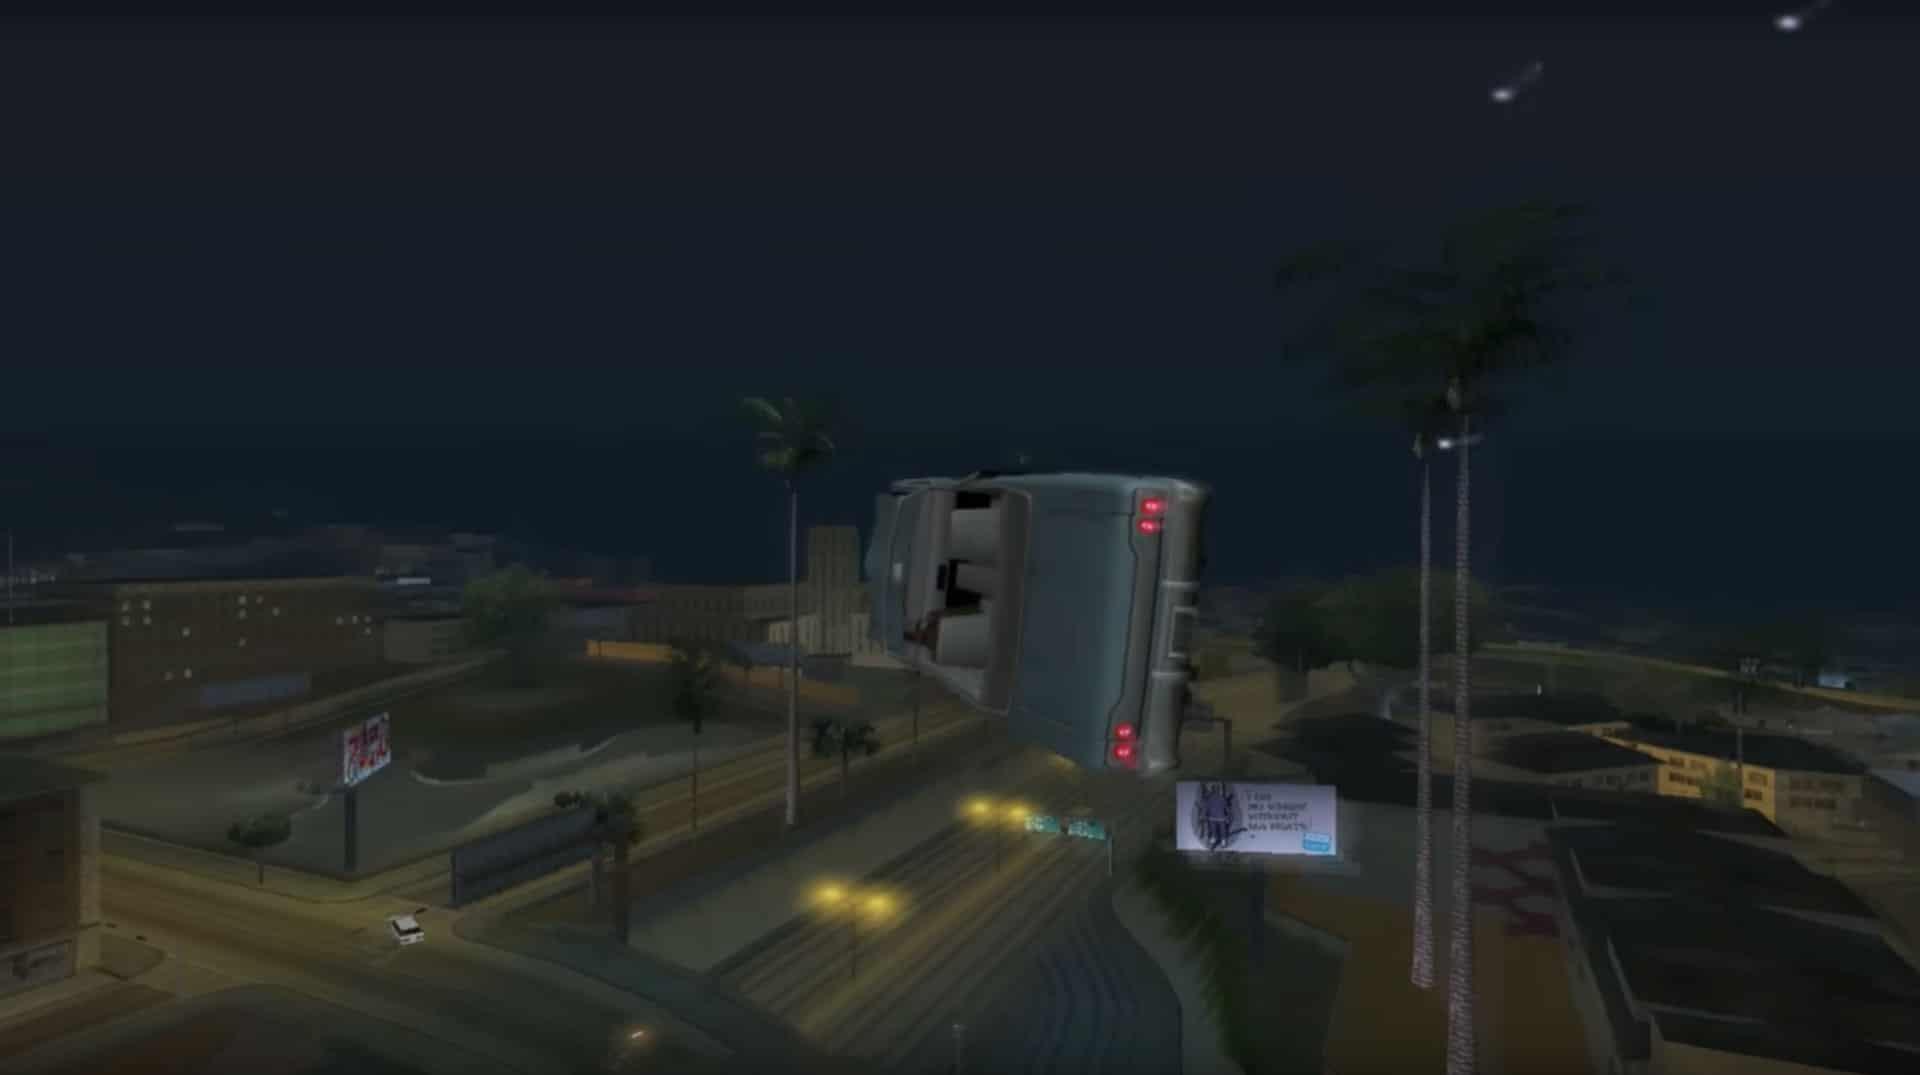 GTA San Andreas Cheats Side Effects - GTA BOOM